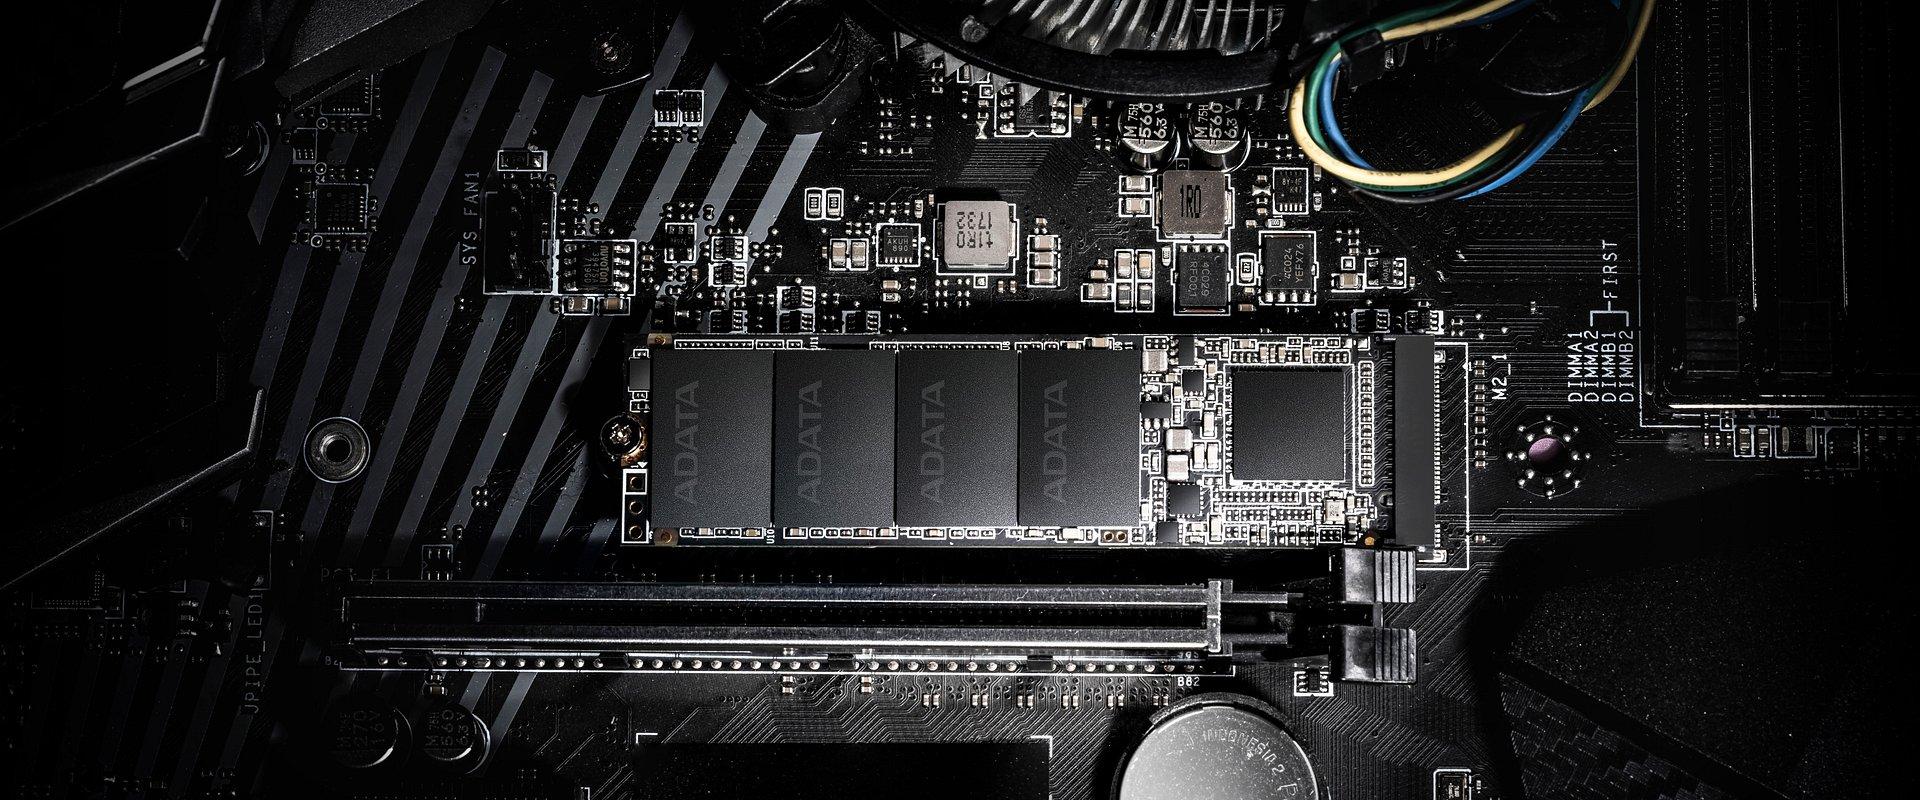 Dyski SSD XPG GAMMIX S11 Pro i XPG SX6000 Lite w ofercie ADATA